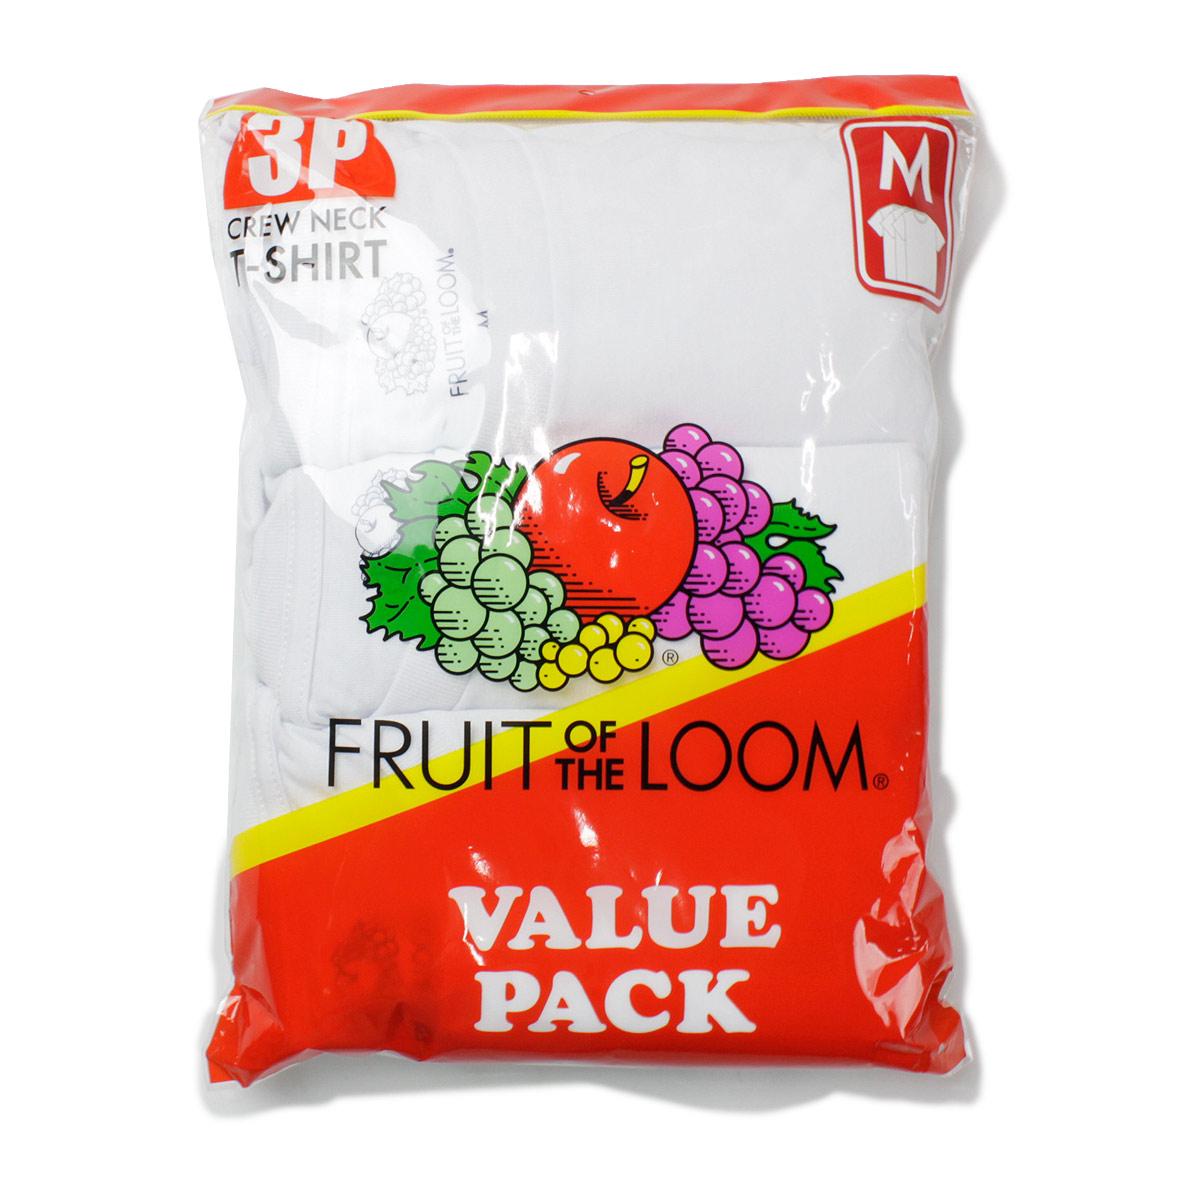 Fruit of the Loom フルーツオブザルーム 3PACK 天竺 TC Tシャツ